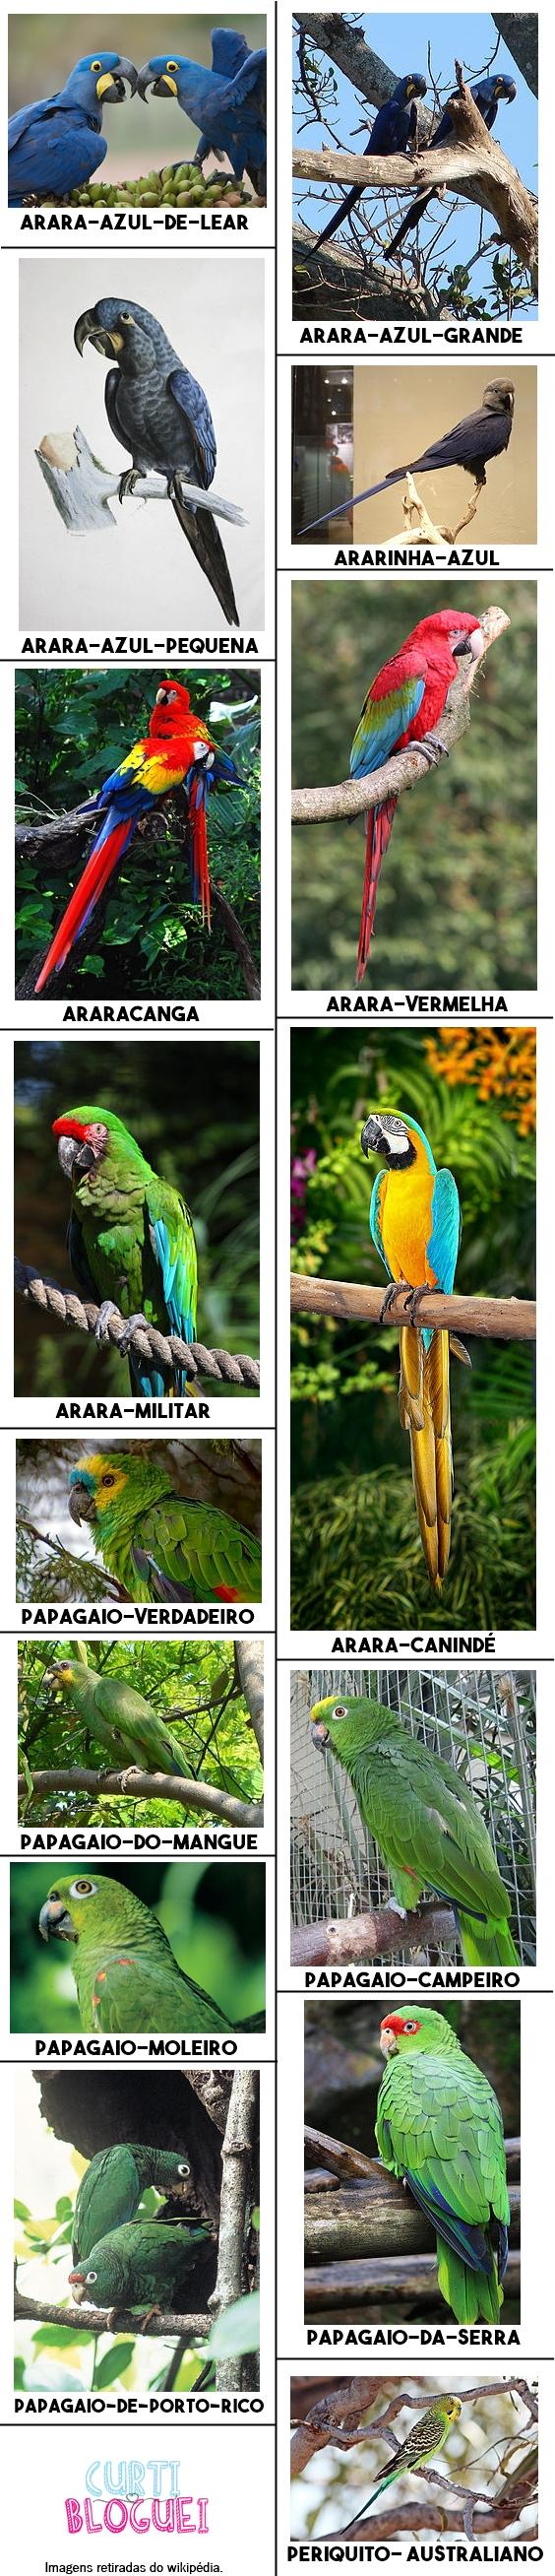 15-especies-de-araras-papagaios-periquitos